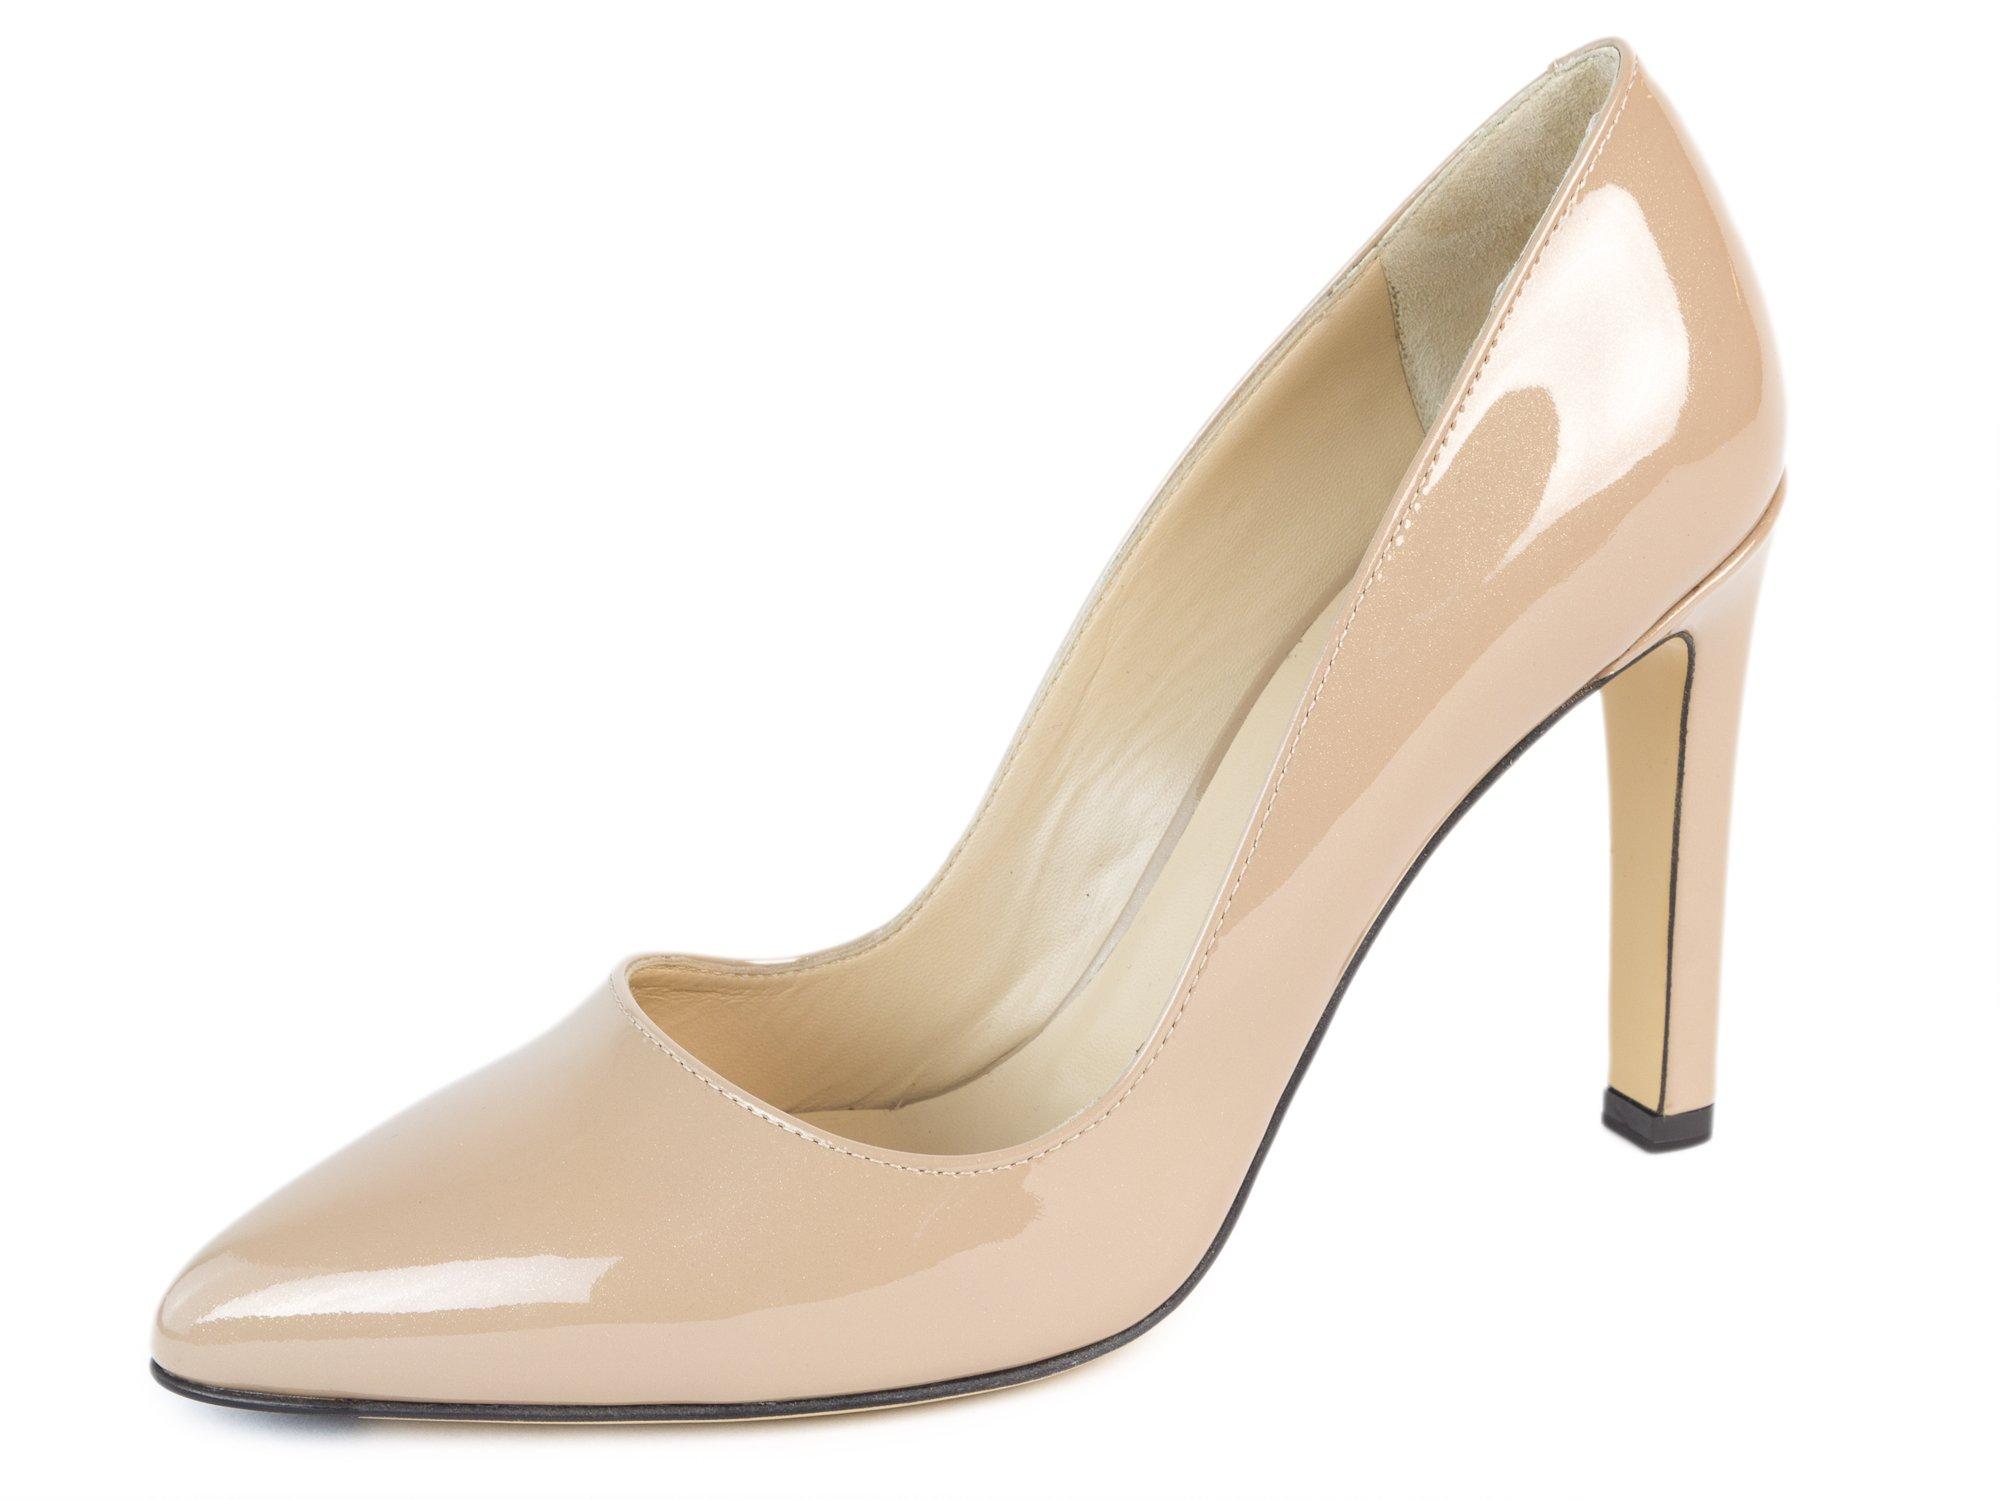 MaxMara Women's Flavia Patent Leather Pumps US 7.5/IT 37.5 Nude